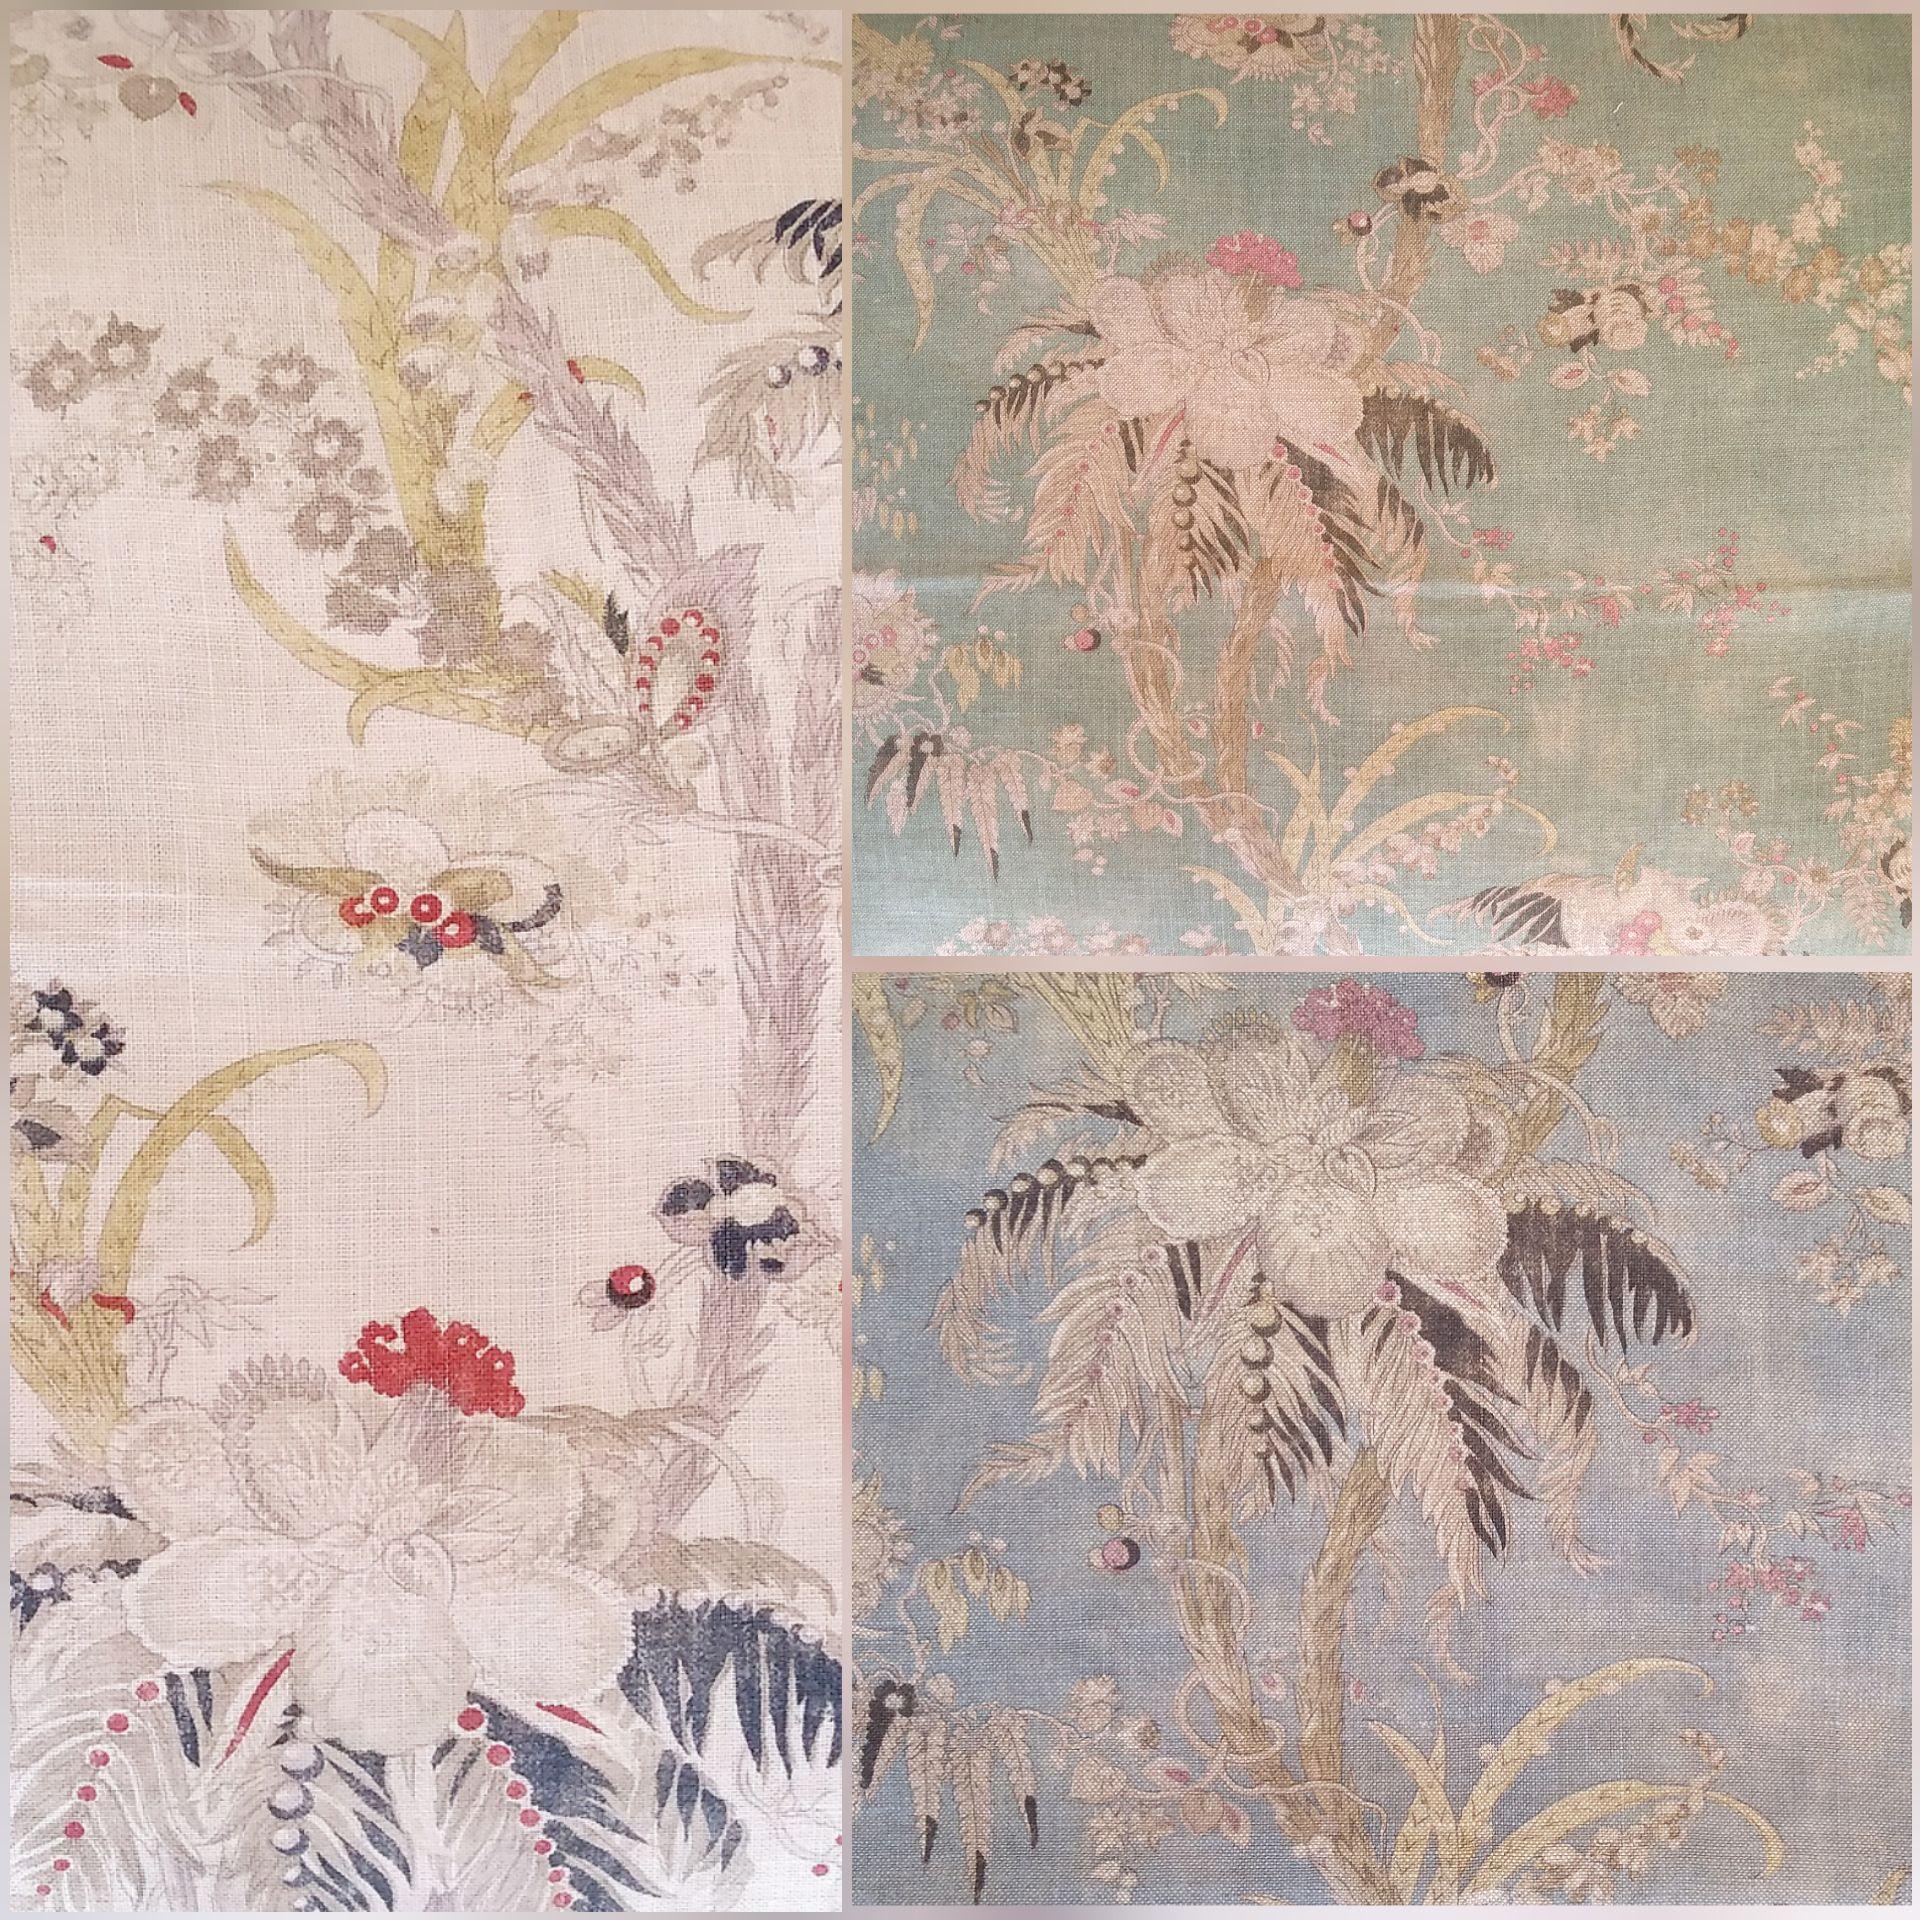 New Arrival Magnolia Fabrics Fabric Store Interior Fabric